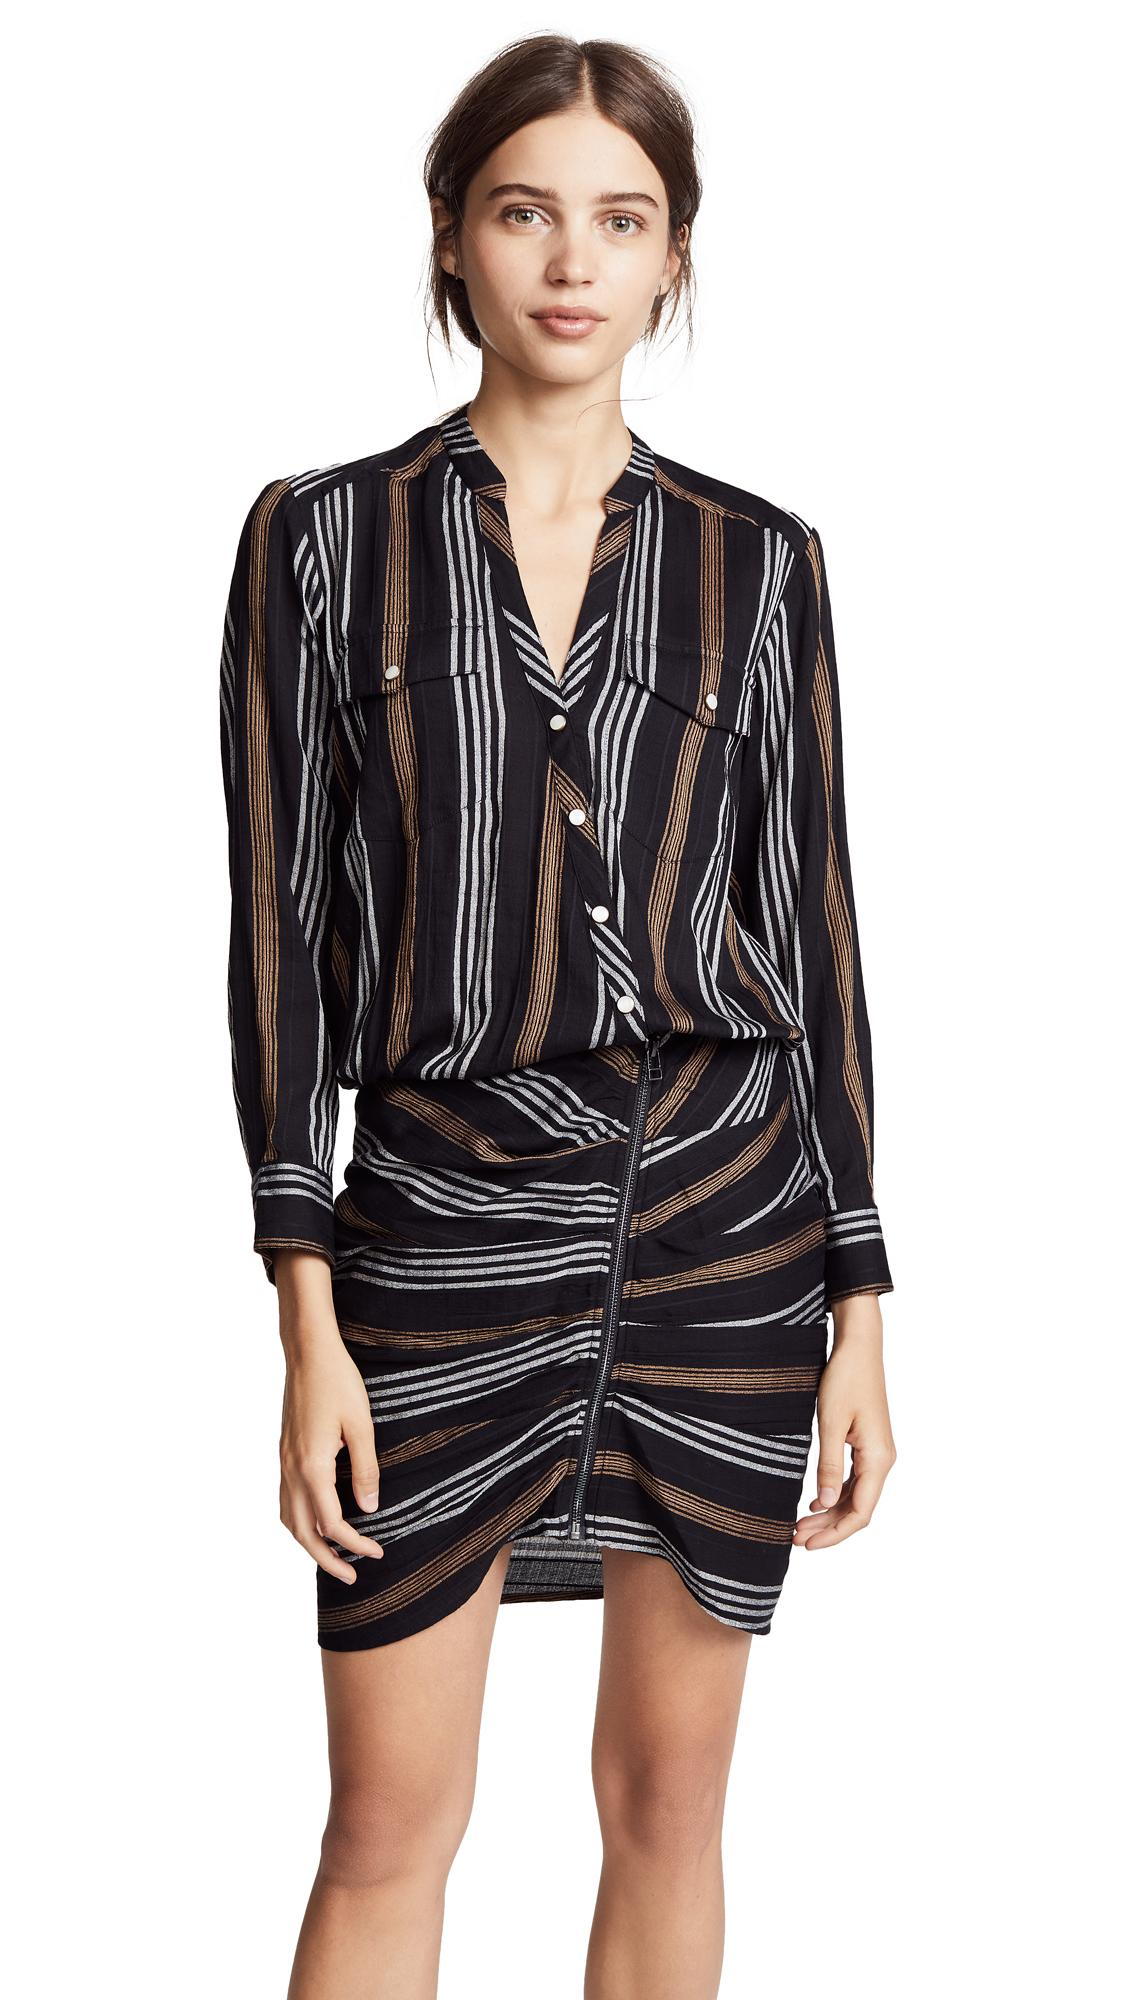 Veronica Beard Emory Dress In Black Stripe Multi